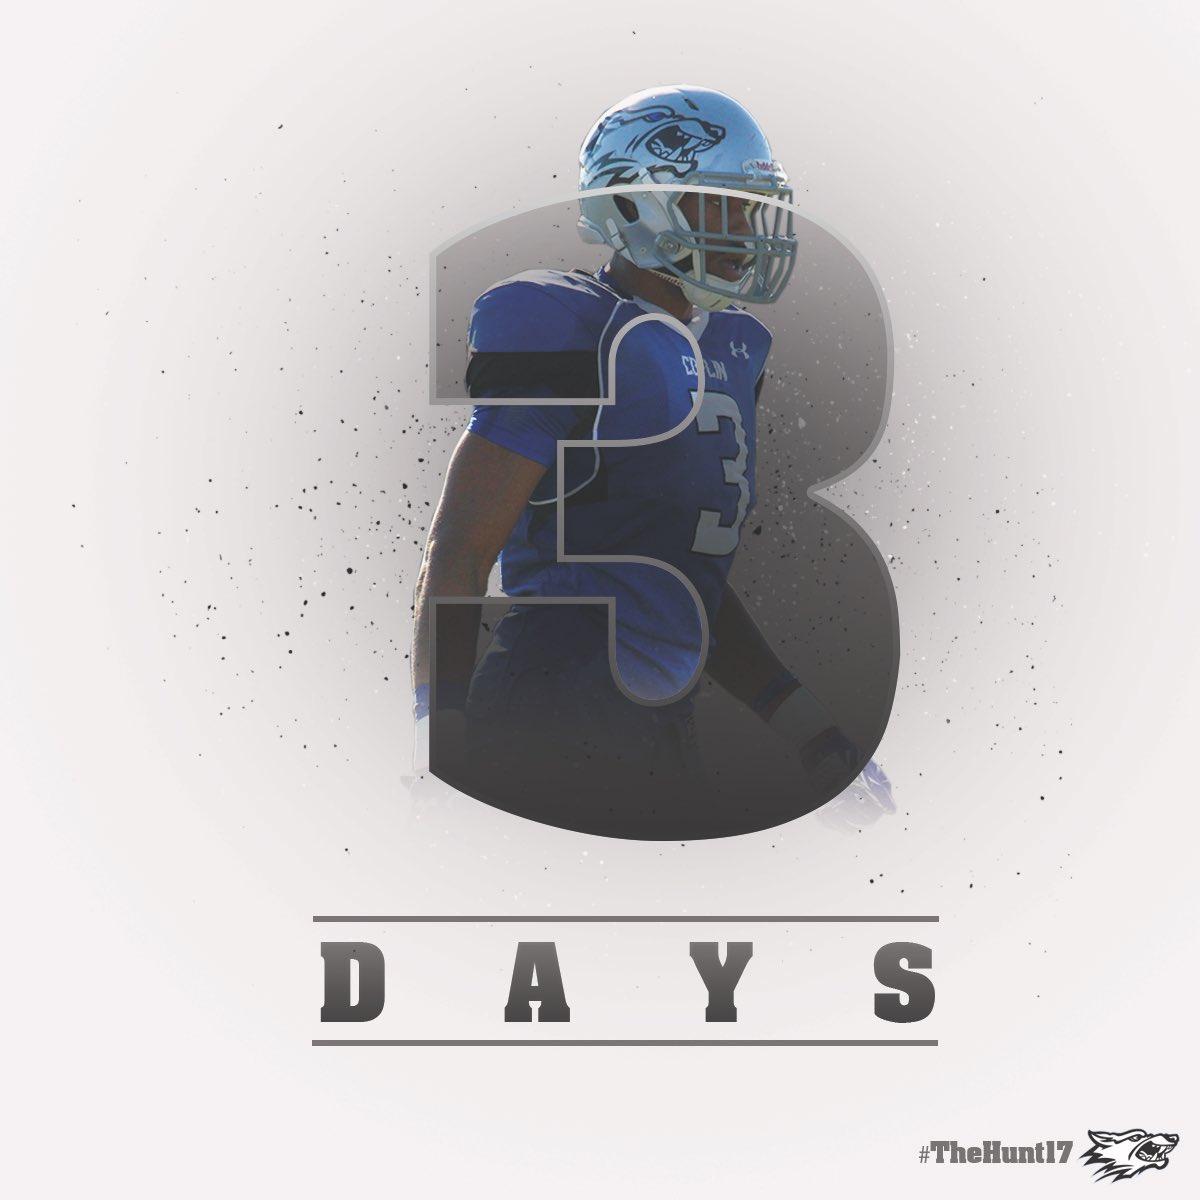 3️⃣ days till pay day 💸💰#TheHunt17